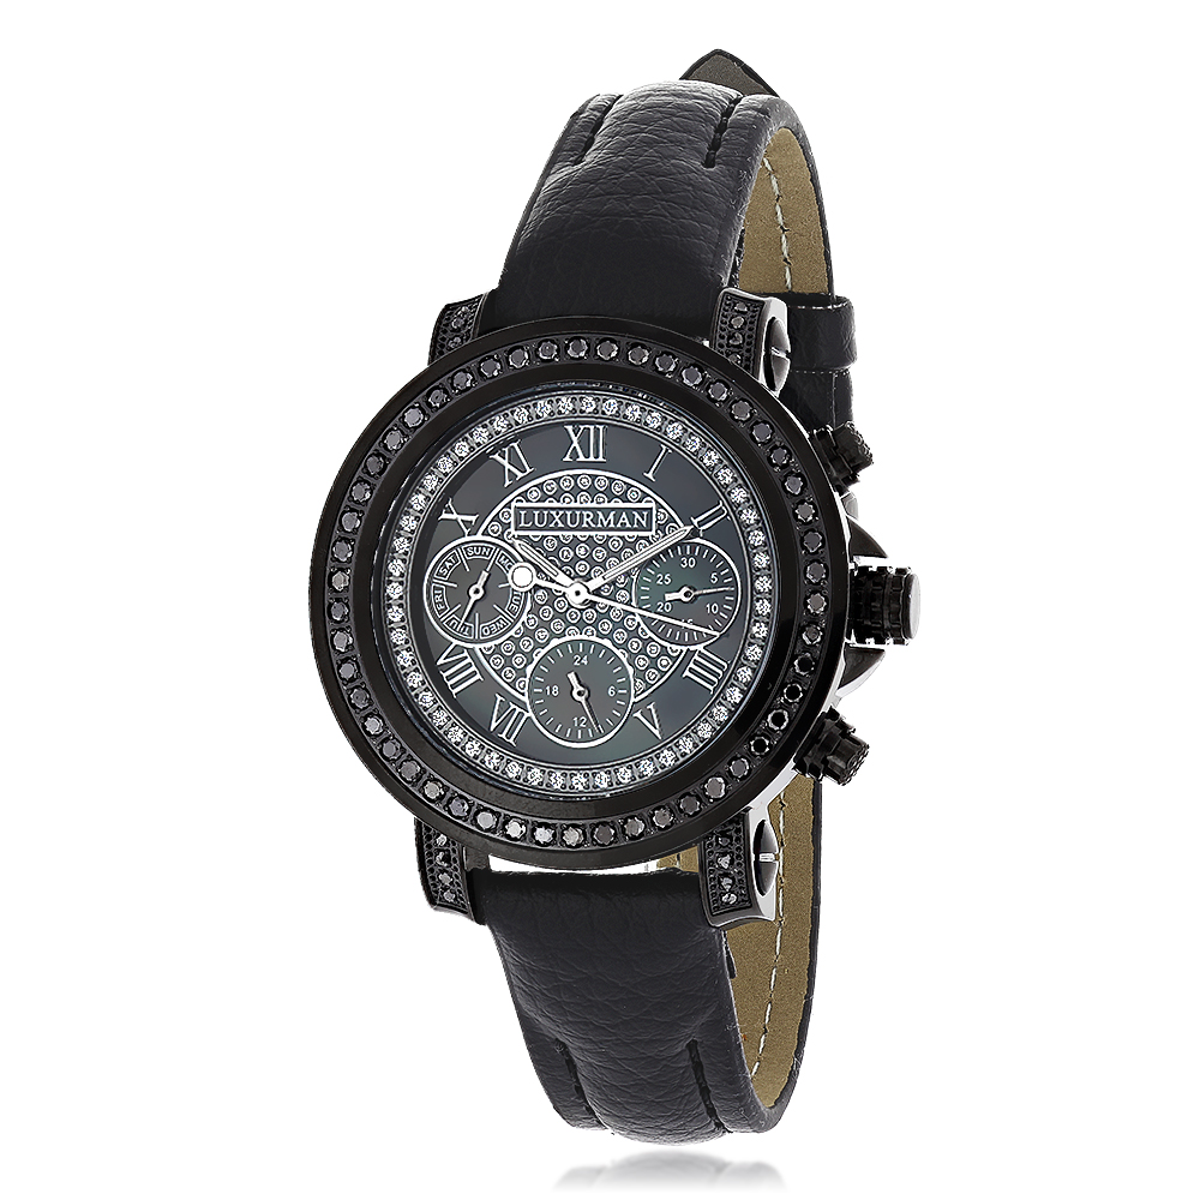 Ladies Black Diamond Watch 2.15ct LUXURMAN Watches